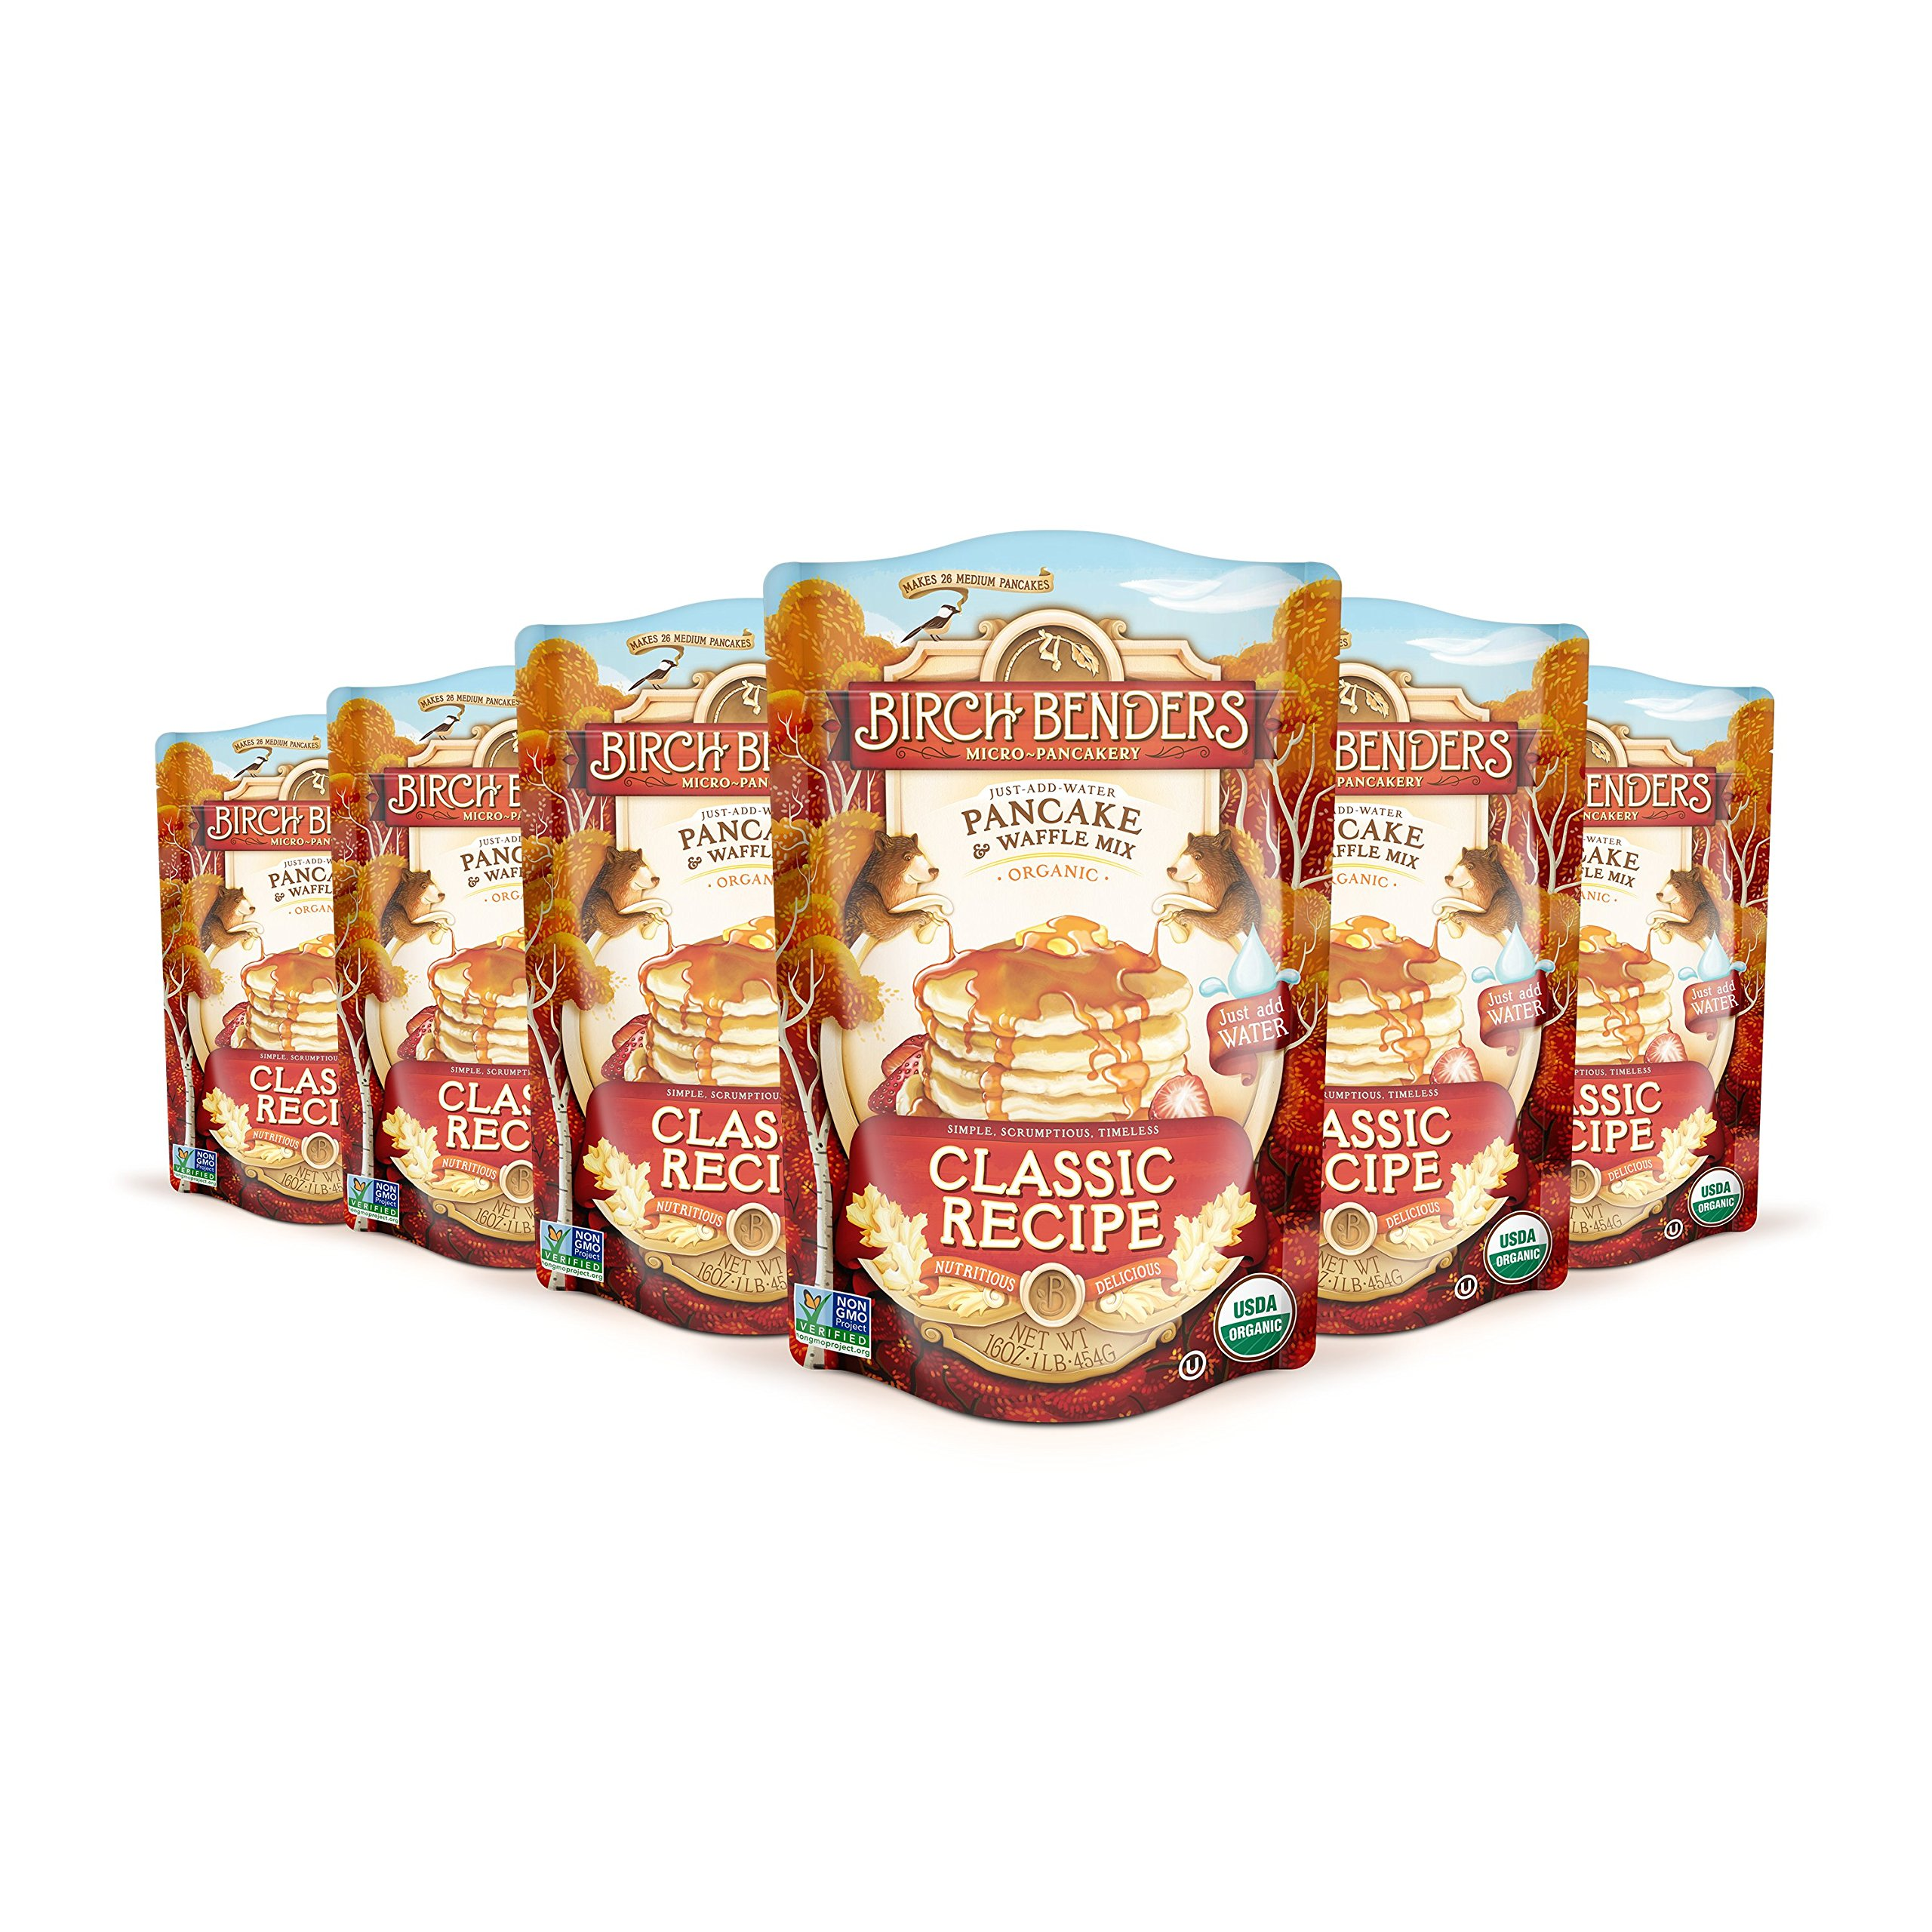 Birch Benders Organic Classic Recipe Pancake and Waffle Mix, 16 Ounce - 6 per case.